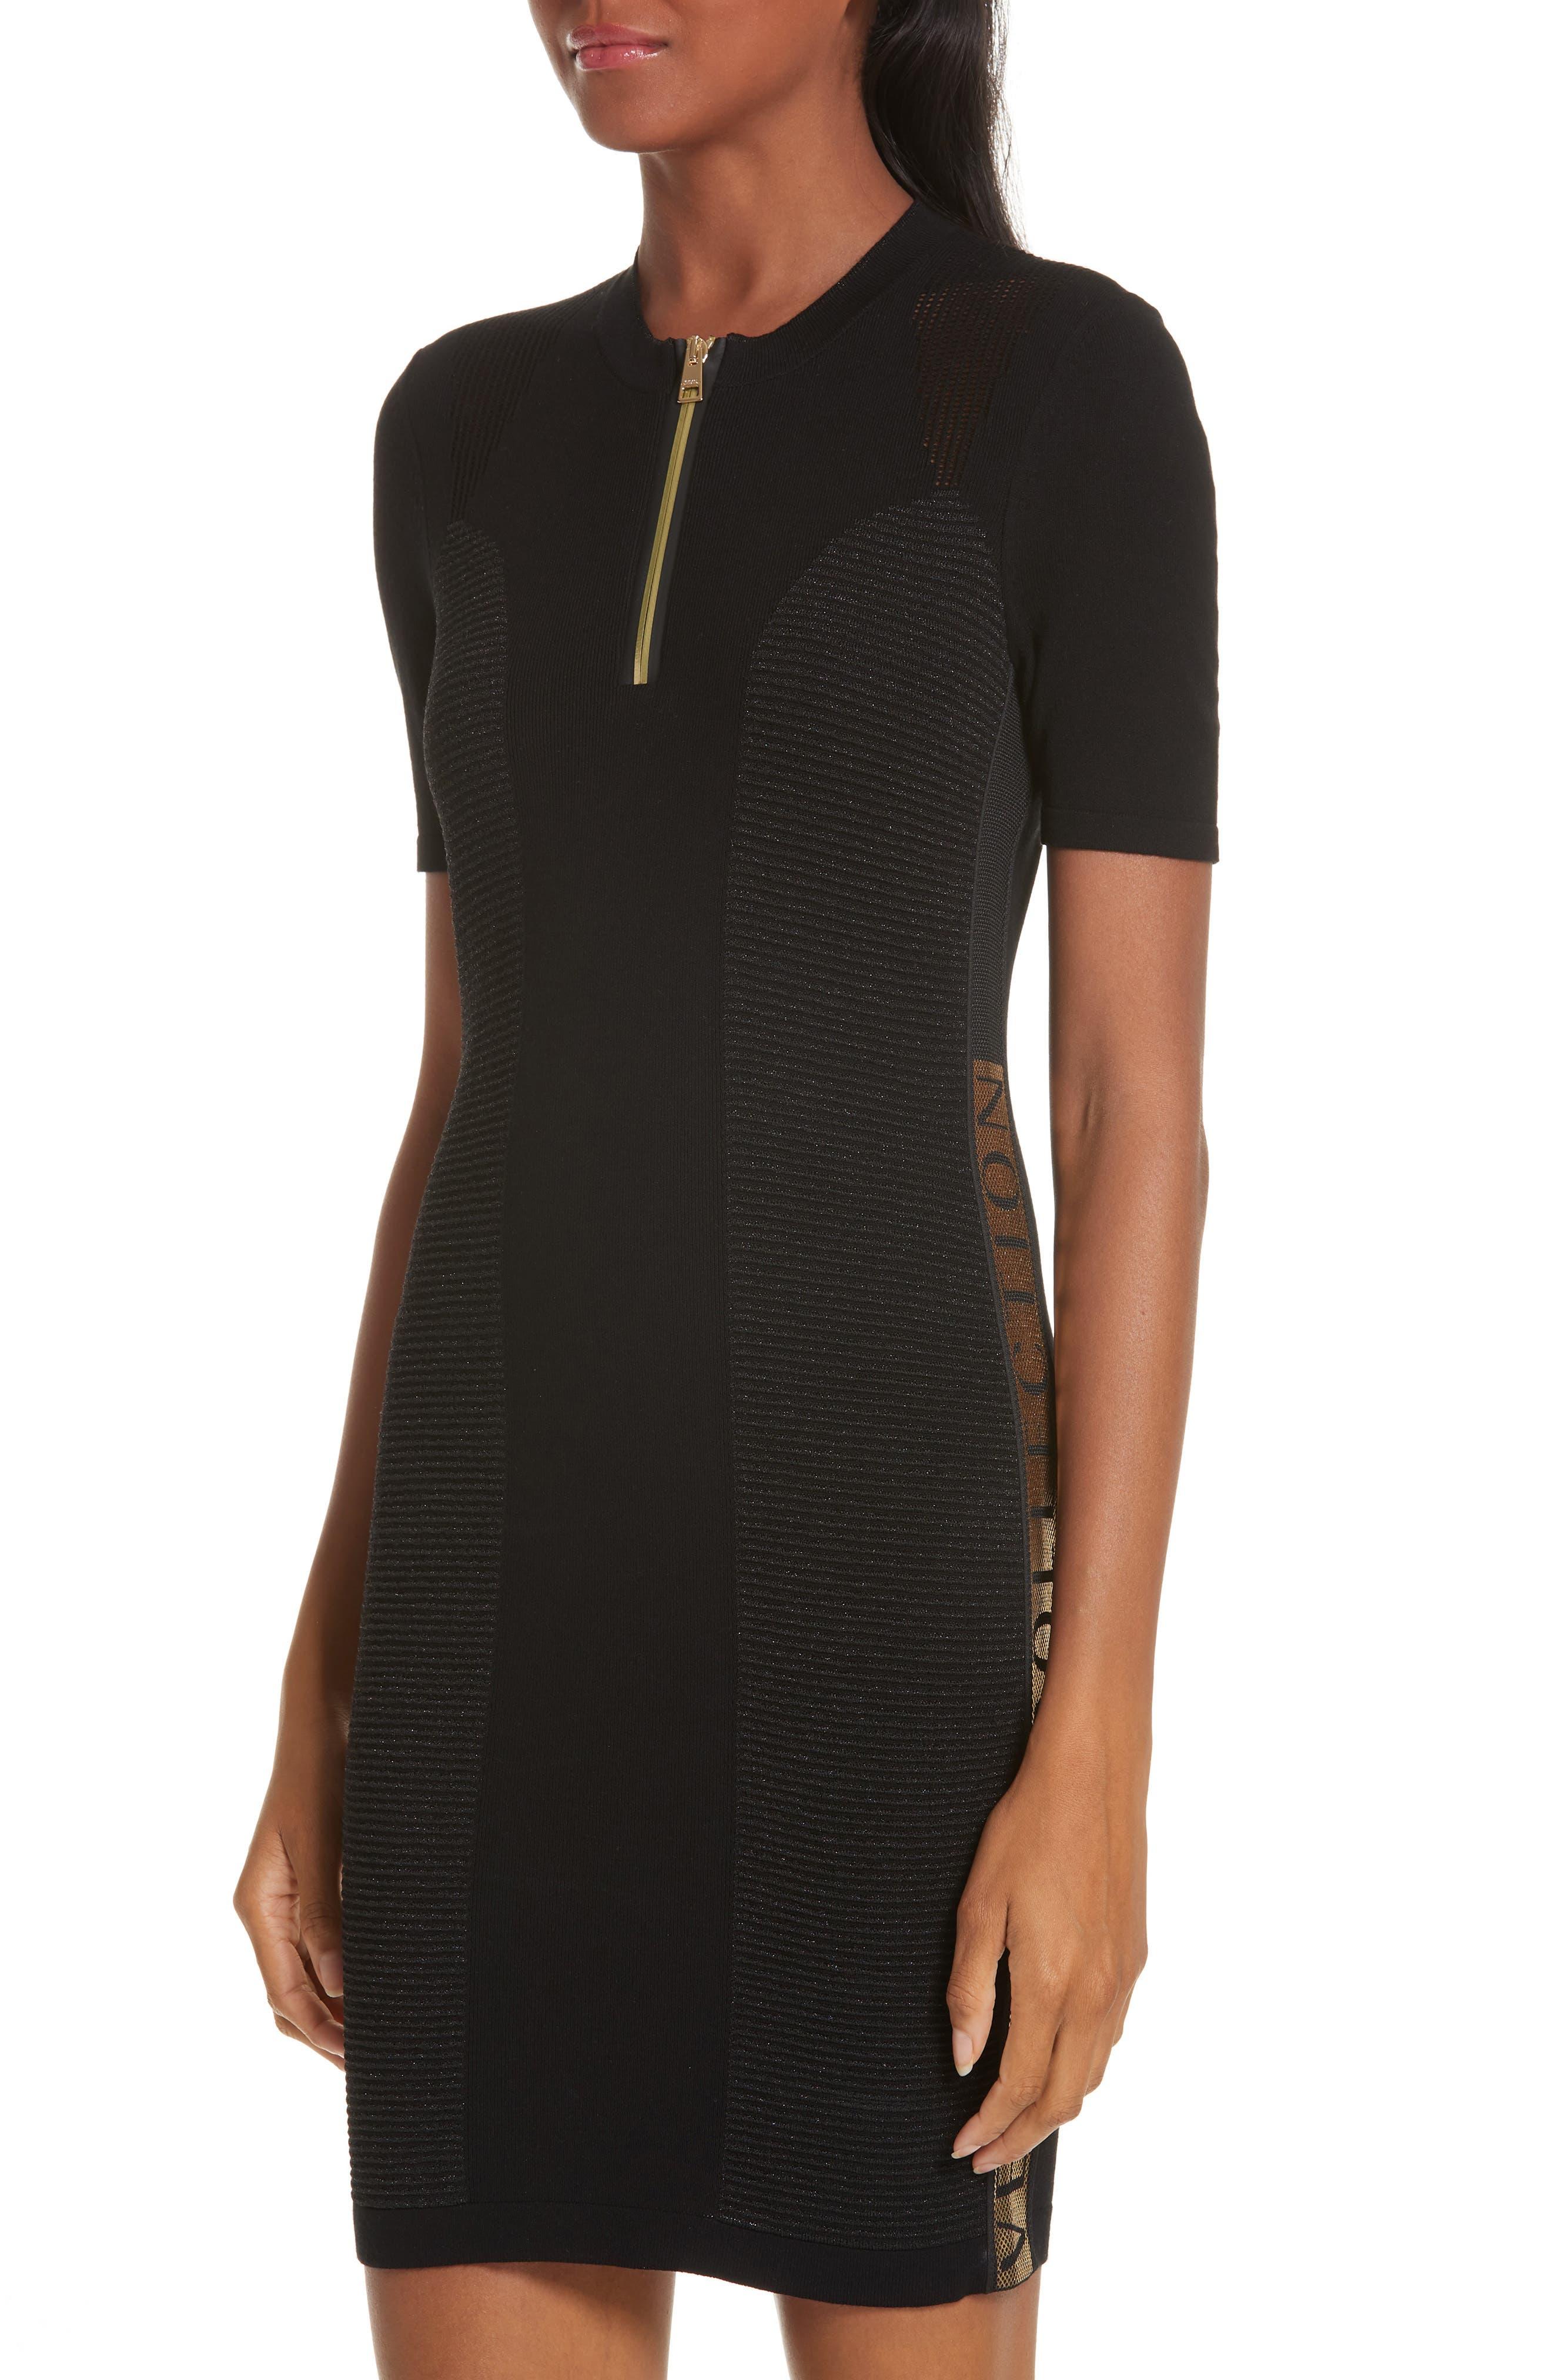 VERSACE COLLECTION, Logo Trim Body-Con Dress, Alternate thumbnail 5, color, BLACK